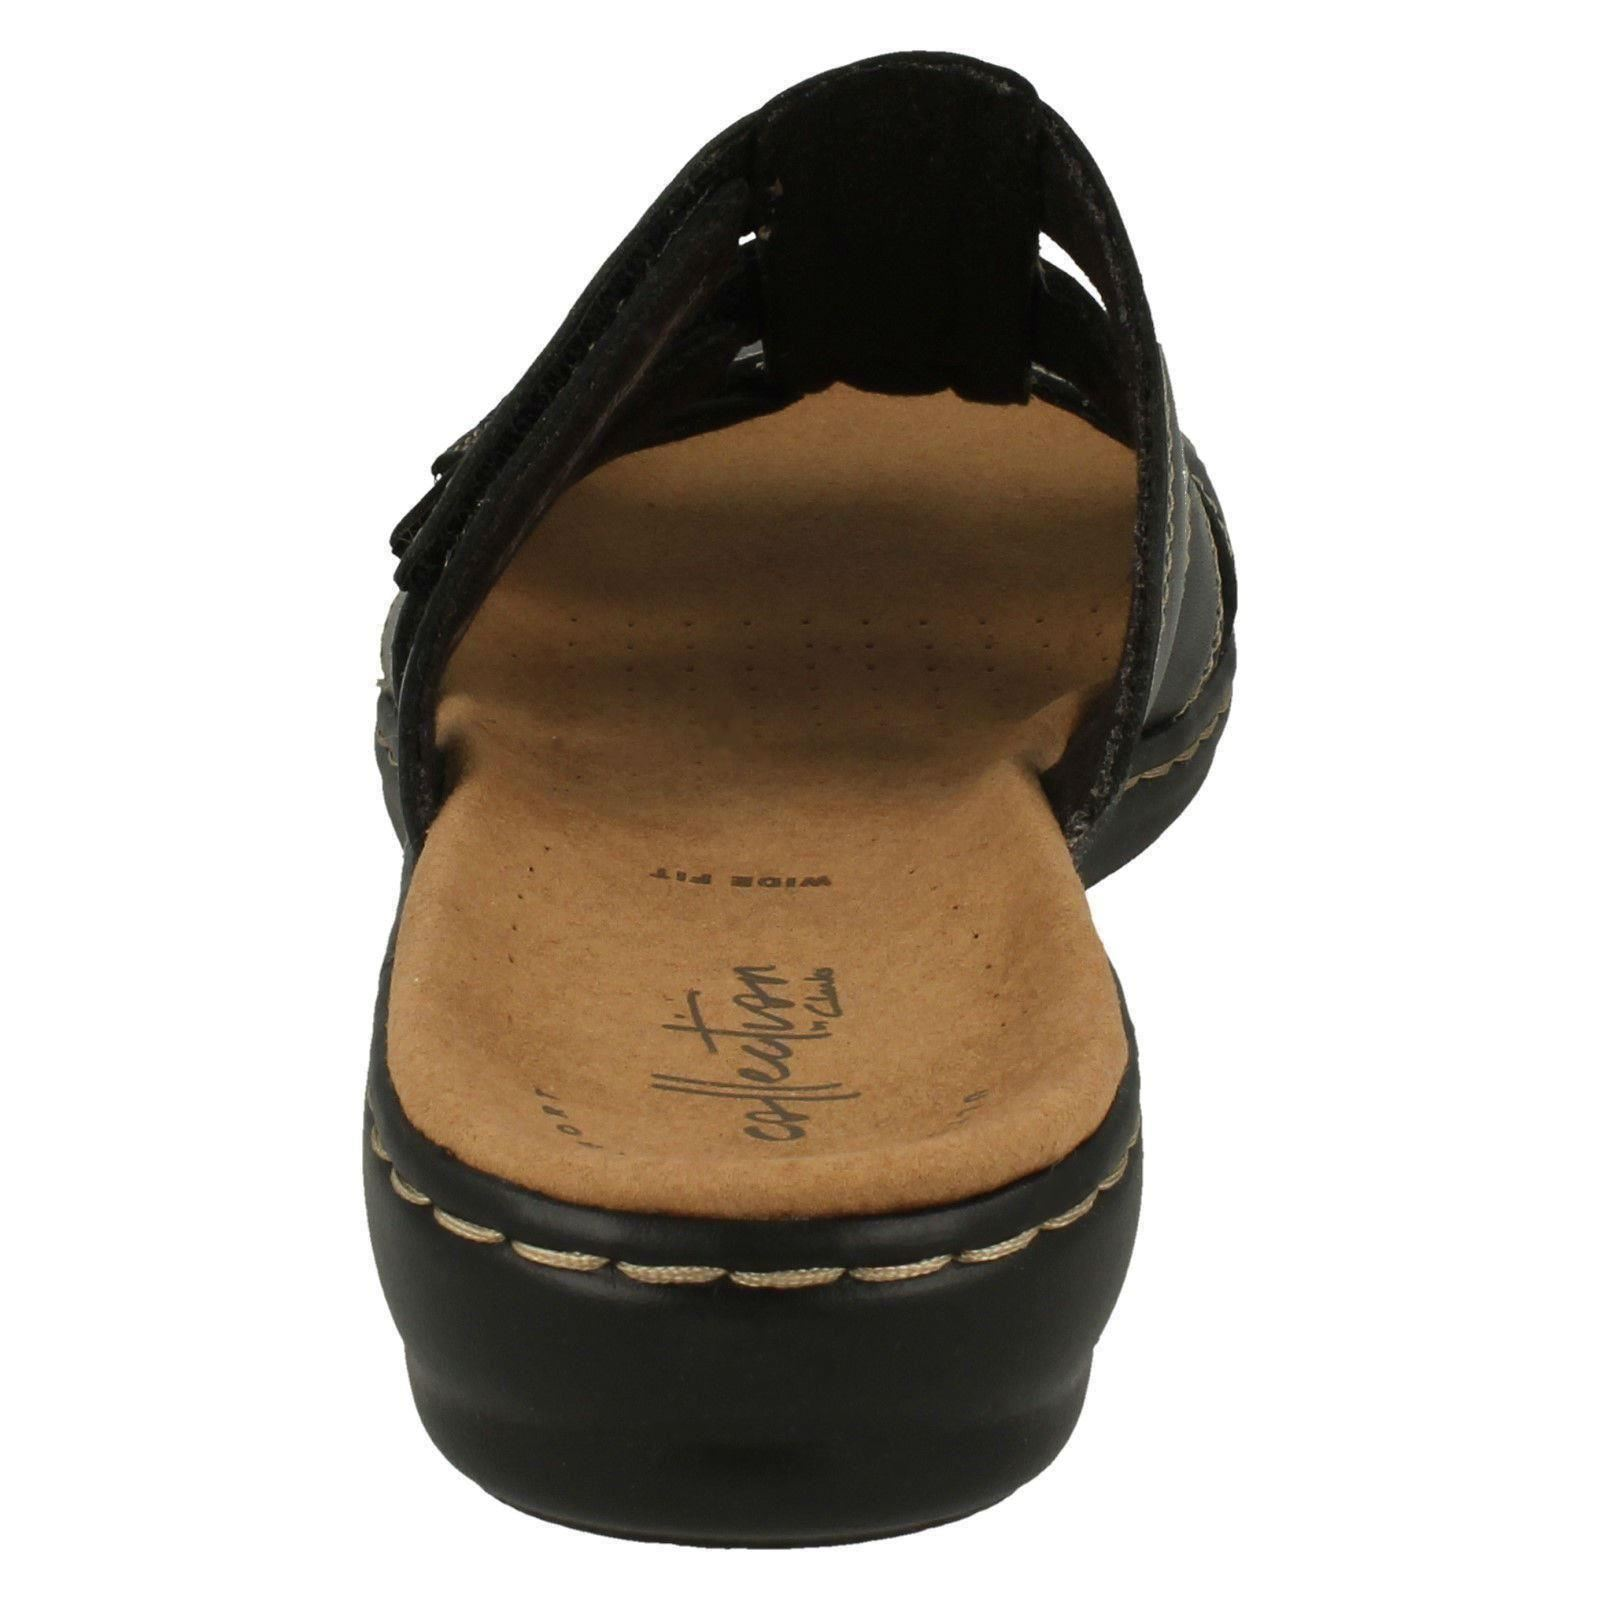 Ladies Clarks Casual Casual Casual Slip-On Mule Sandals Leisa Spring 26be2d